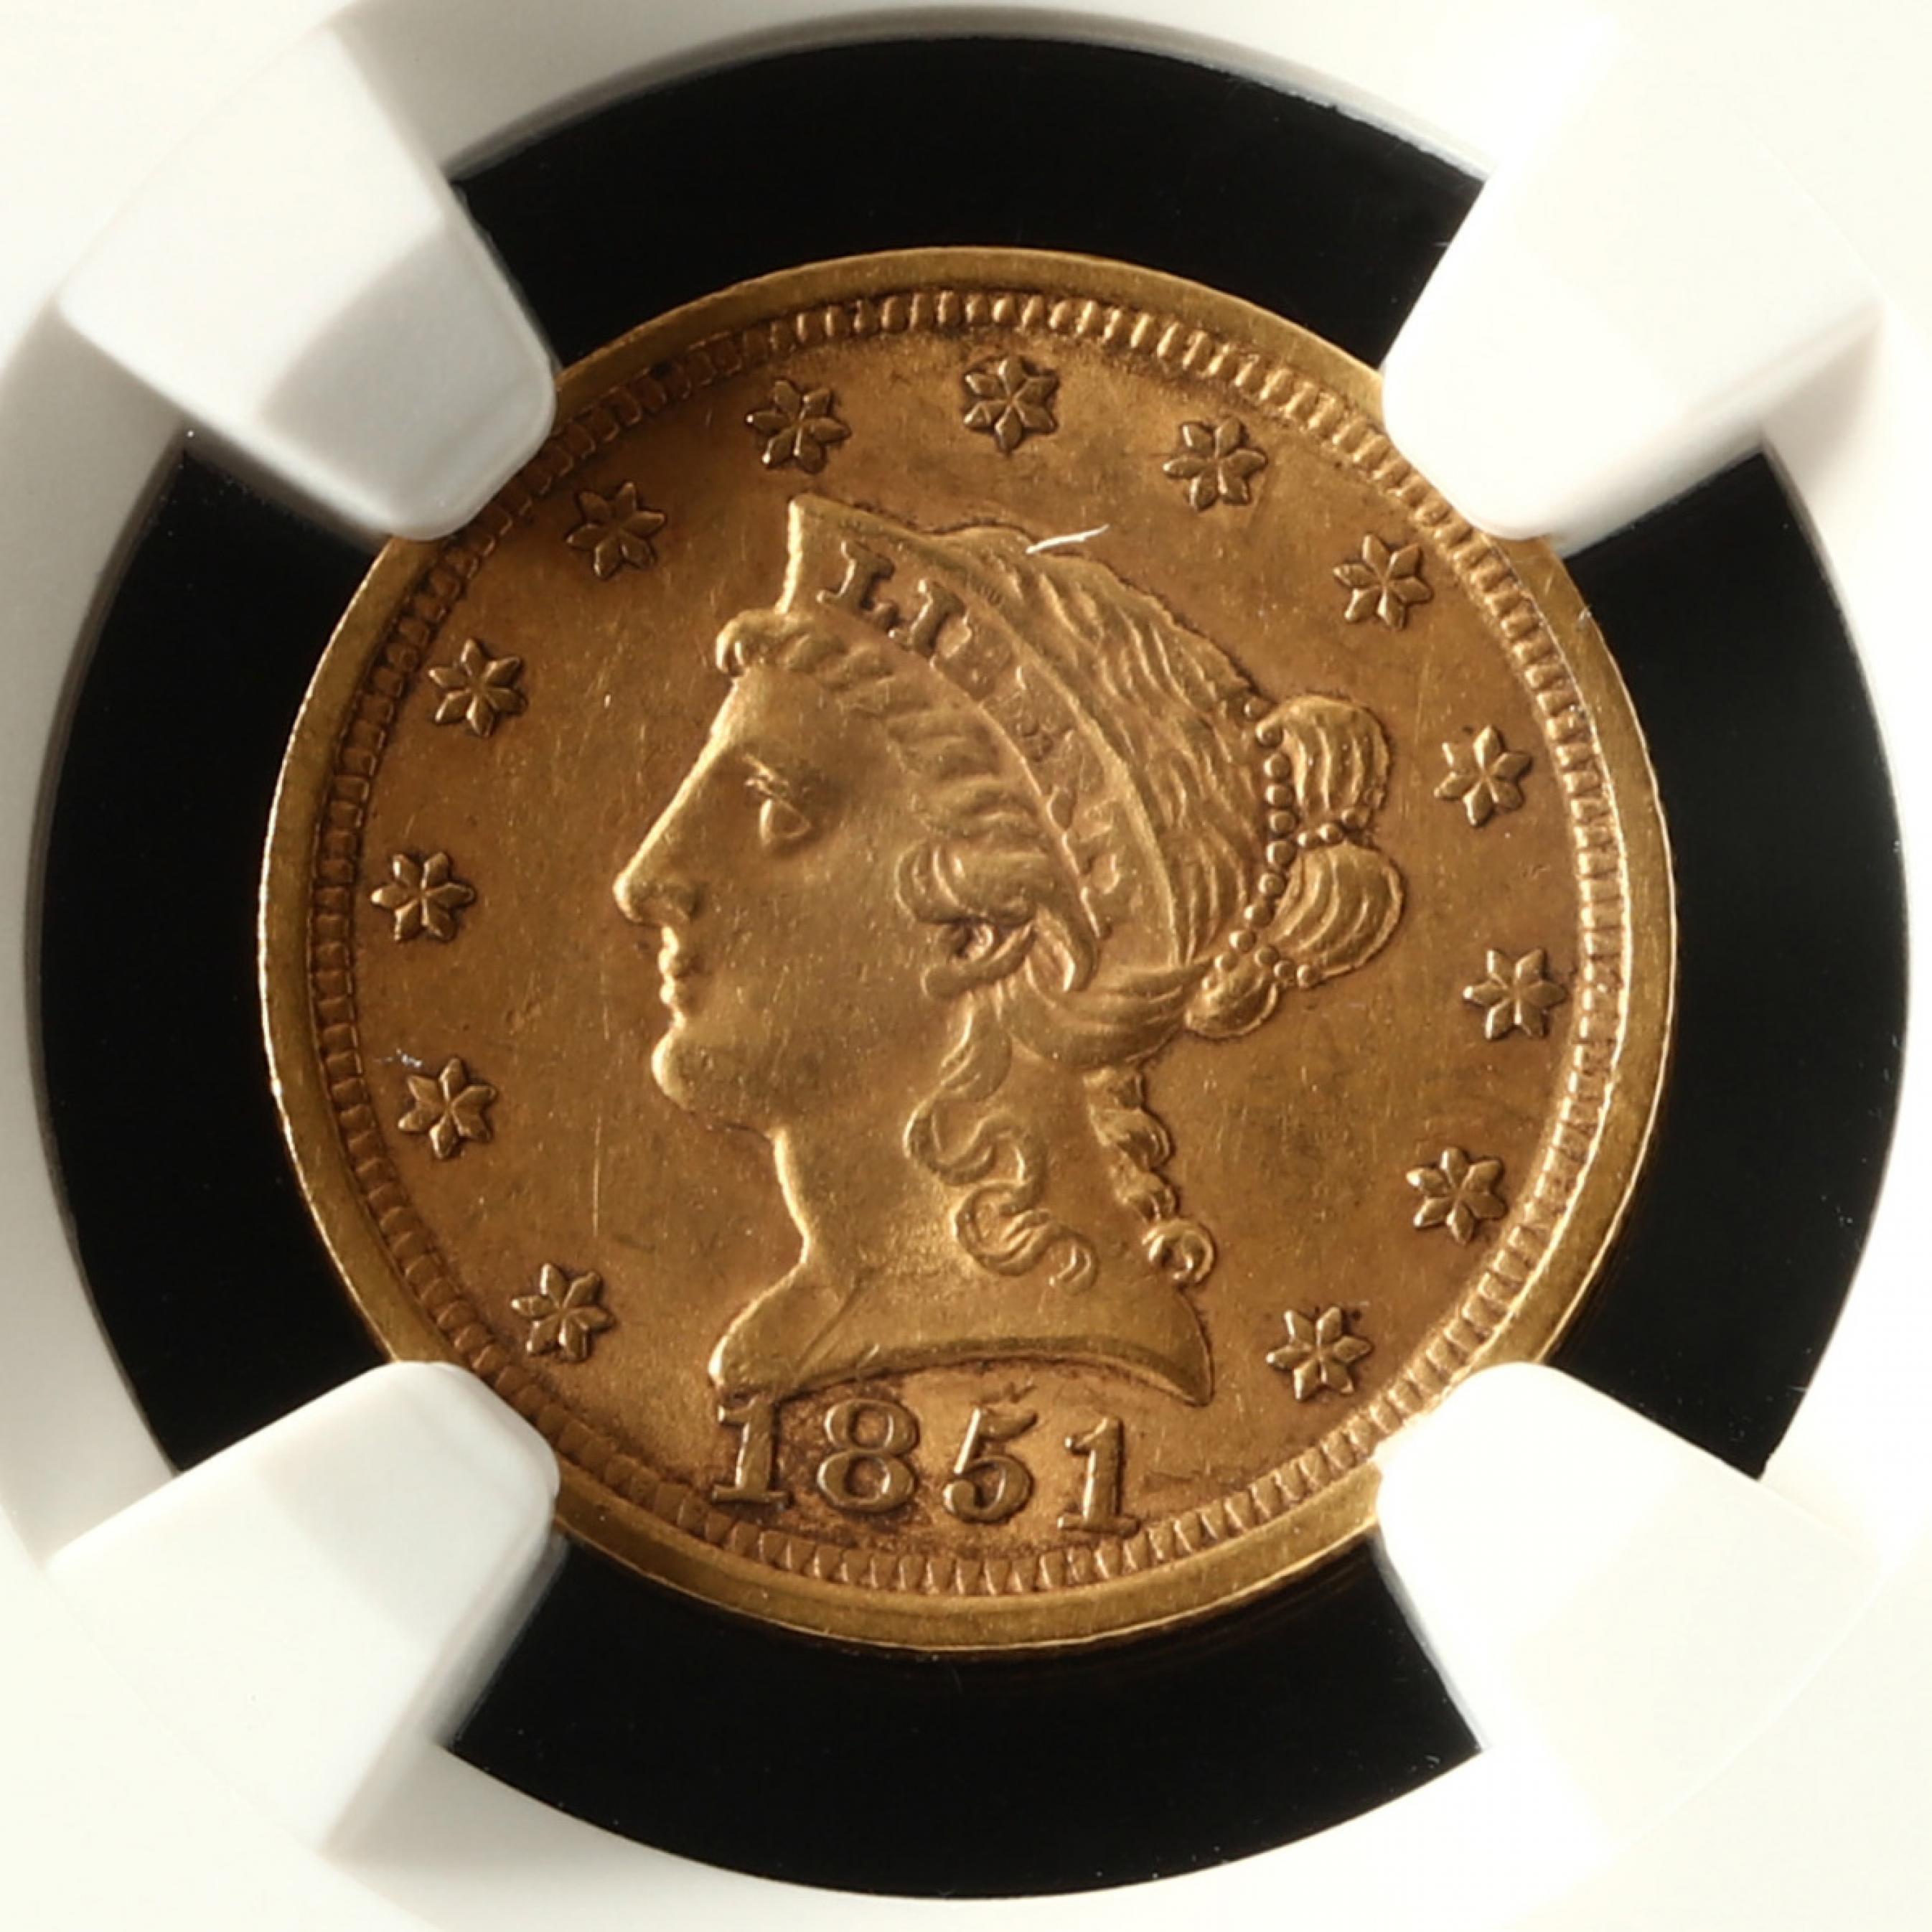 1851-2-50-liberty-head-gold-quarter-eagle-ngc-au55